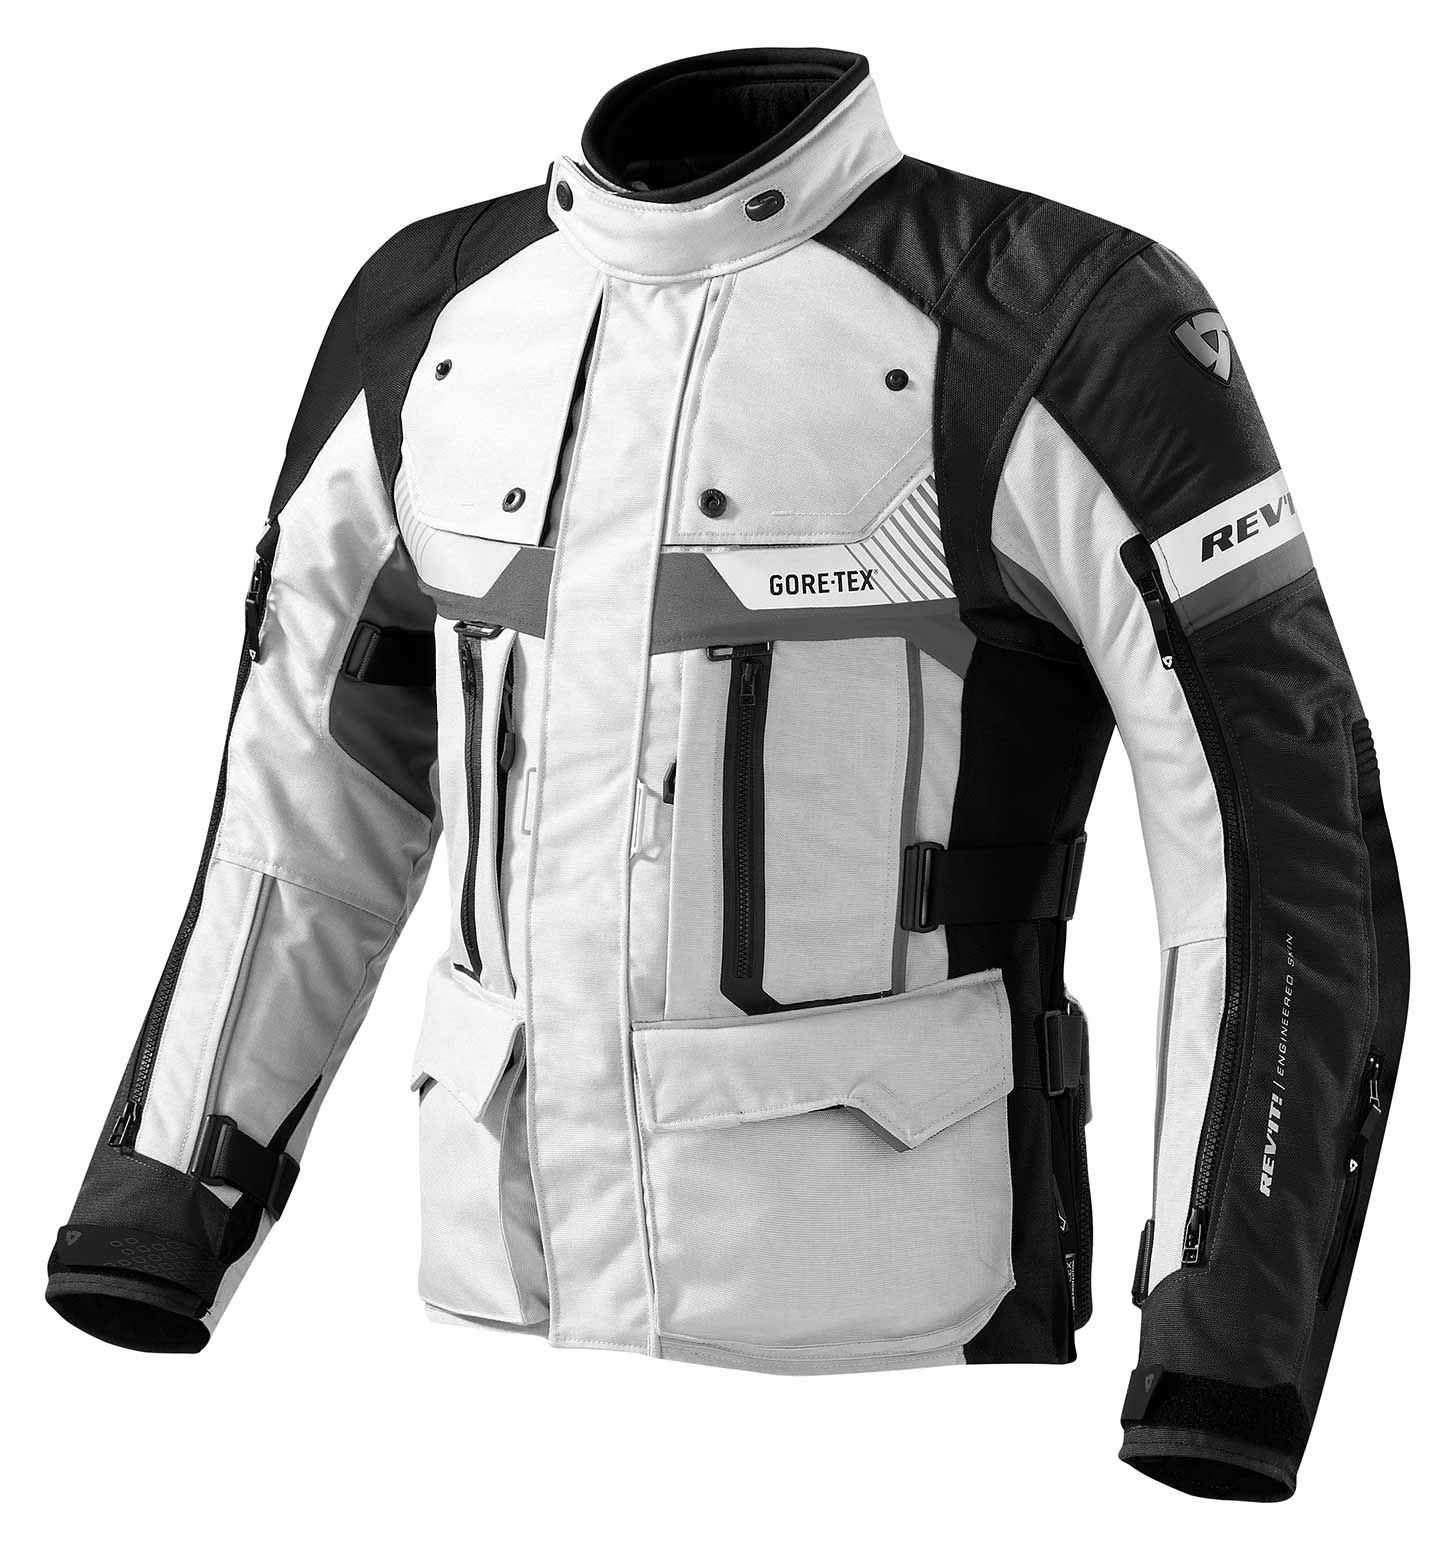 fd4c6410 REV'IT! Defender Pro GTX Jacket | 11% ($100.00) Off! - RevZilla